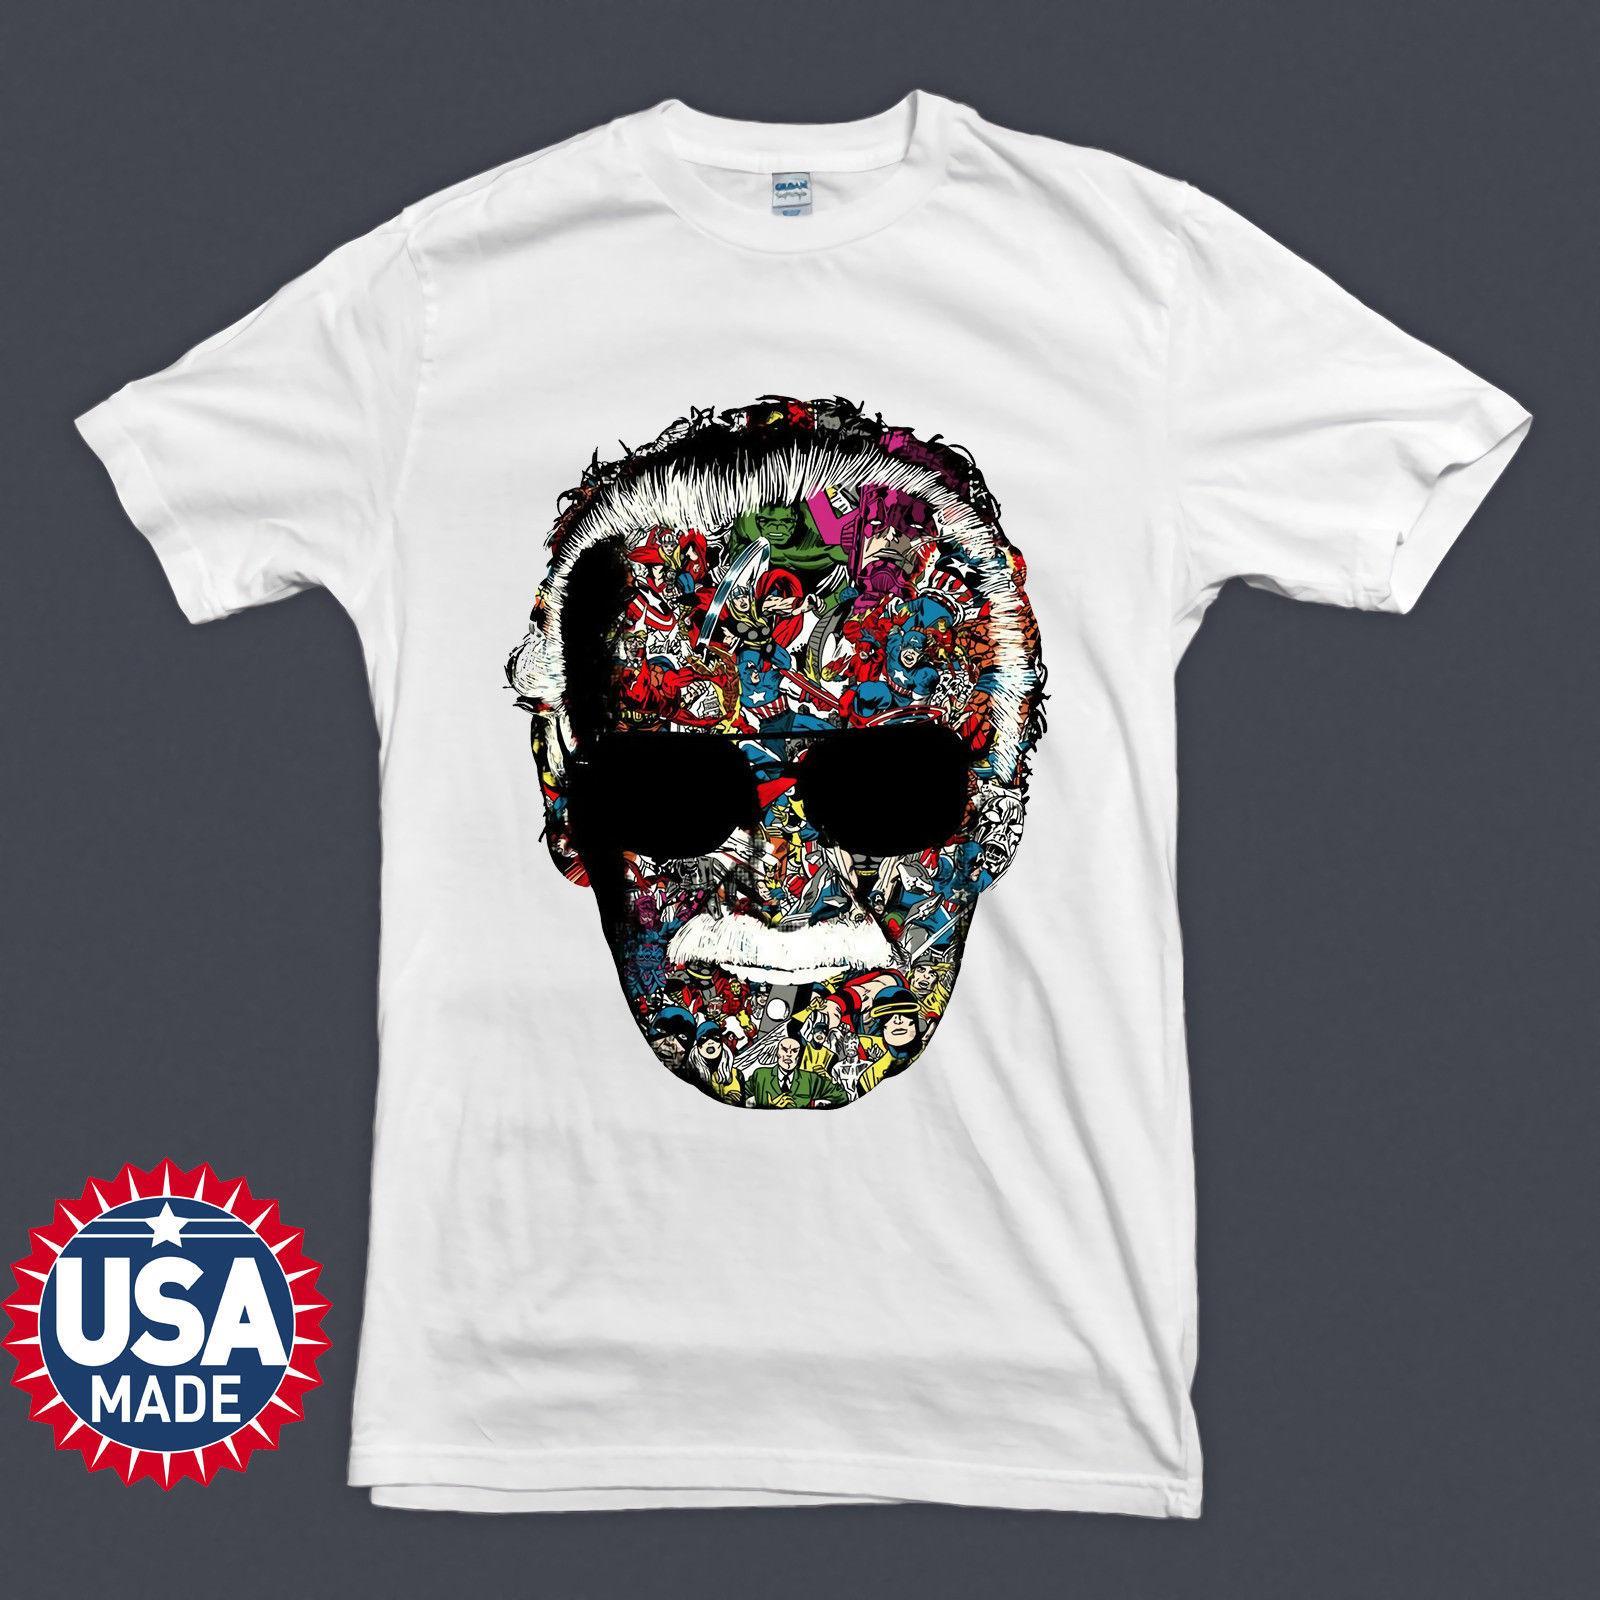 3da104e0d8 Compre Nueva Camiseta Stan Lee Head Hero Inspired Design Camiseta Para  Hombre Tamaño Discout Caliente Nueva Camiseta Hoodie Hip Hop Camiseta A   16.24 Del ...